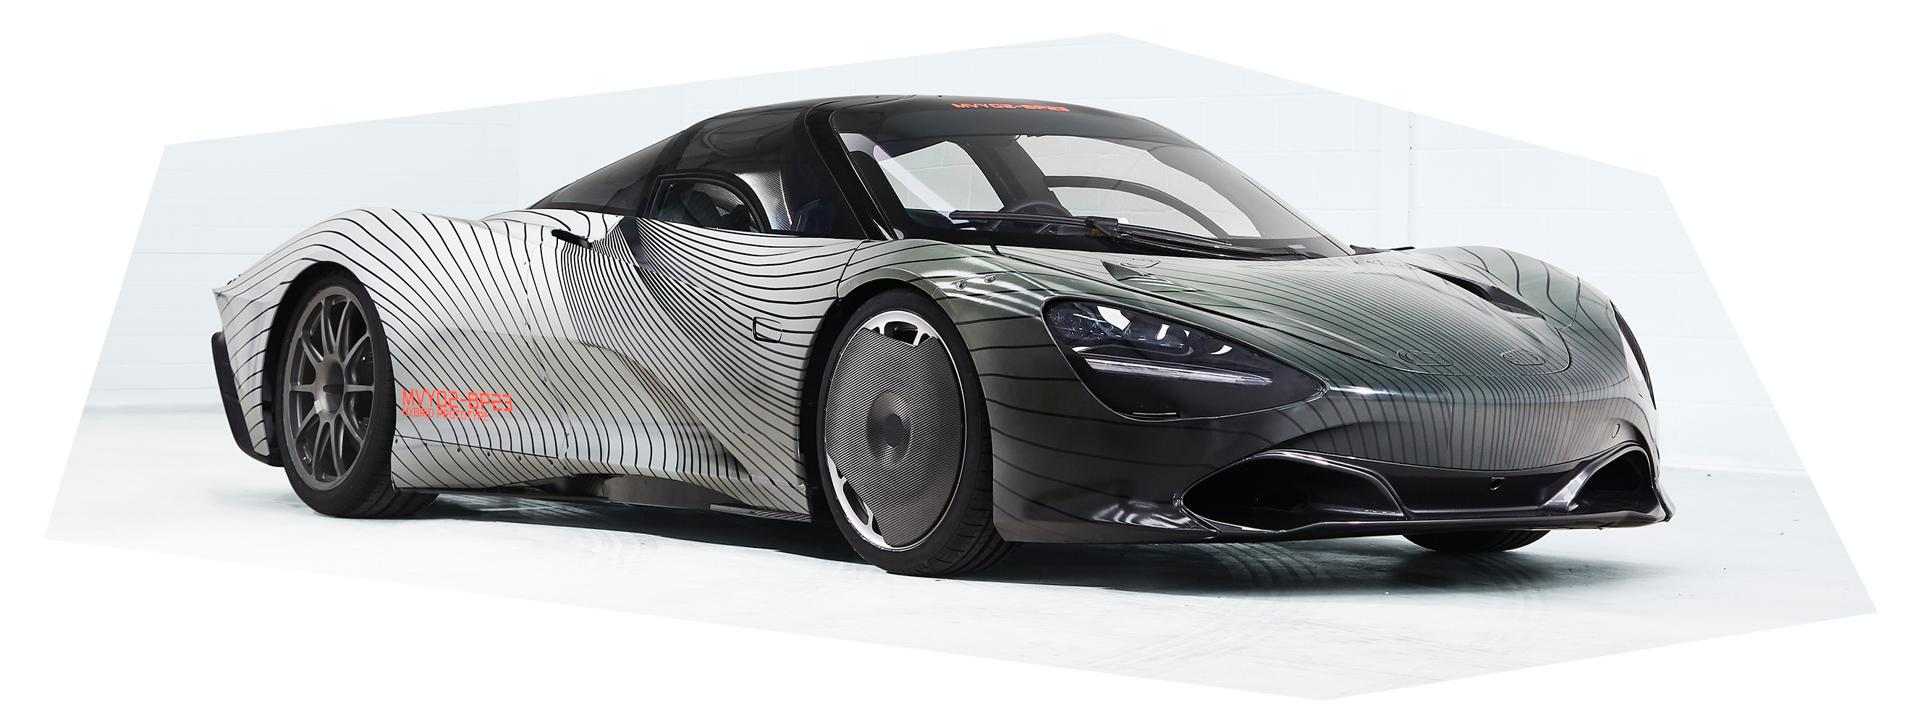 McLarenSpeedtail-stripes-Albert